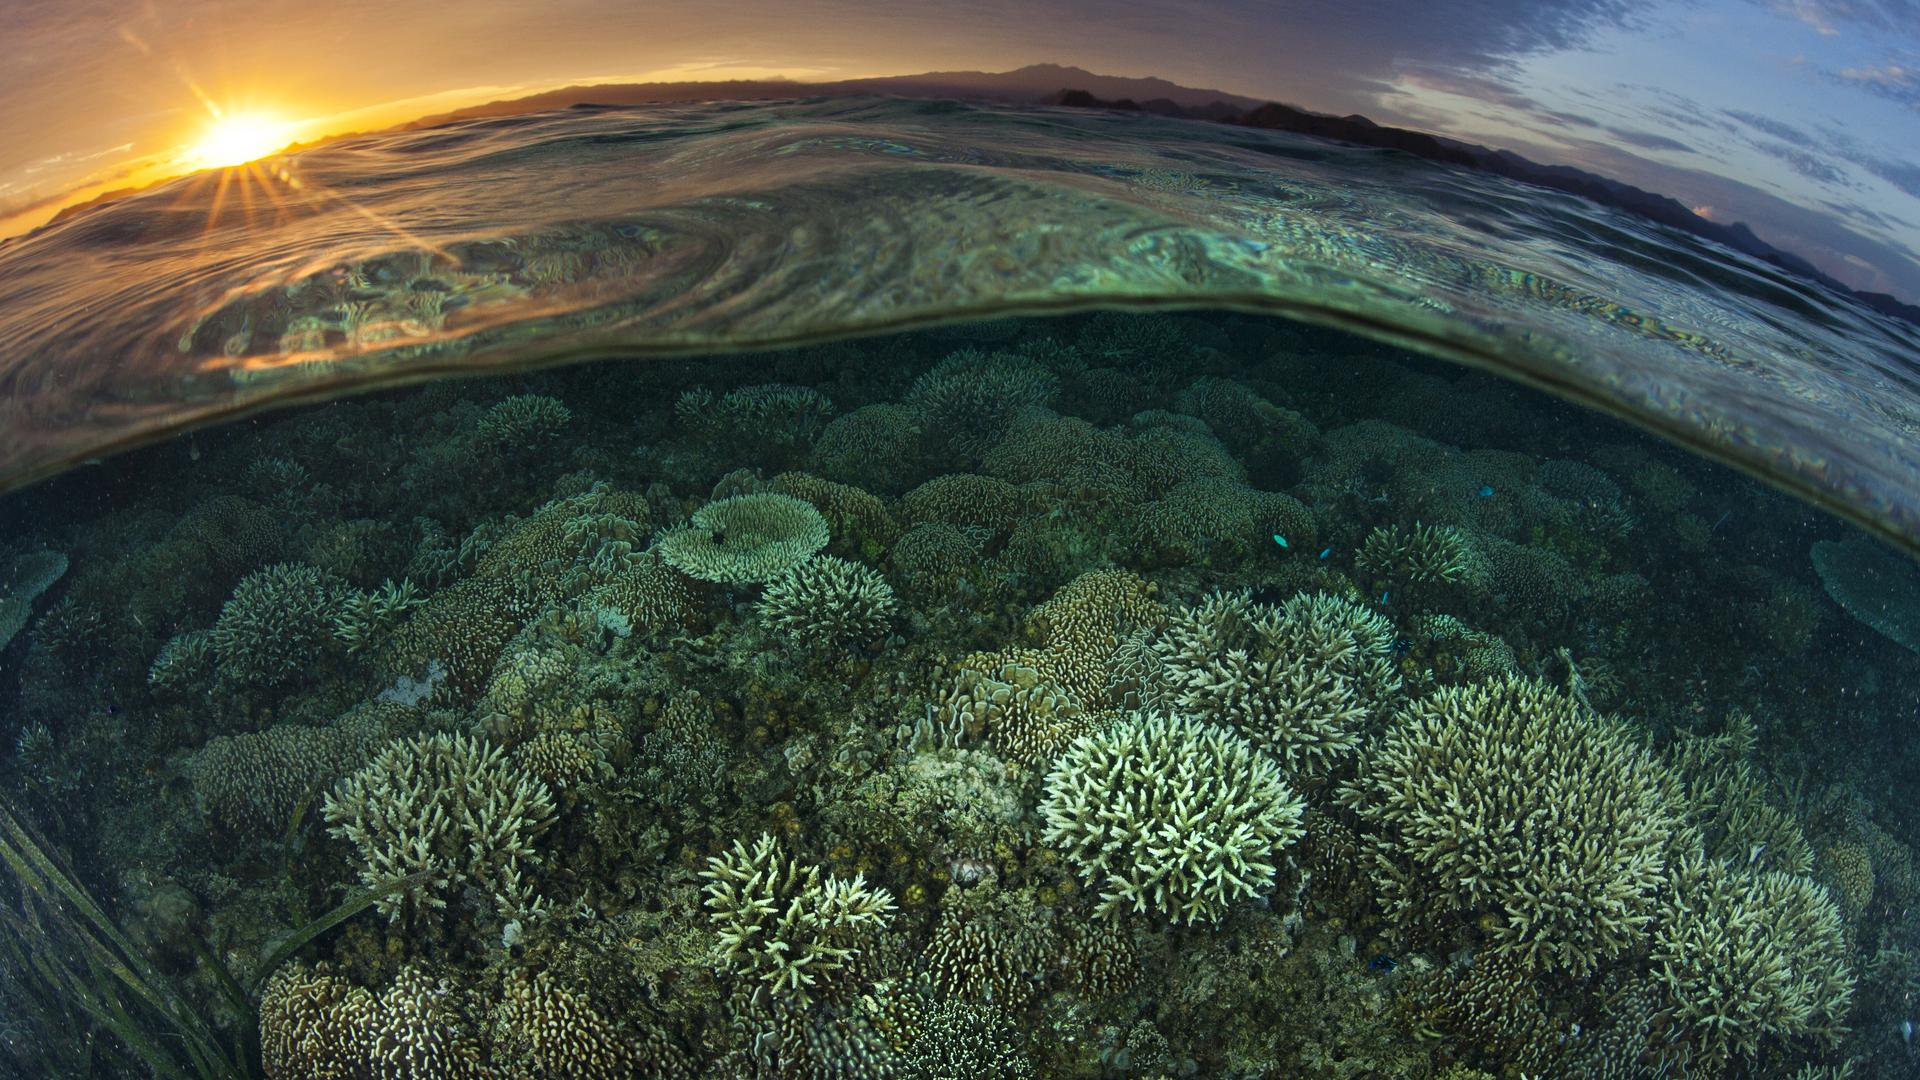 half-underwater-and-half-on-the-water-5k-z2.jpg